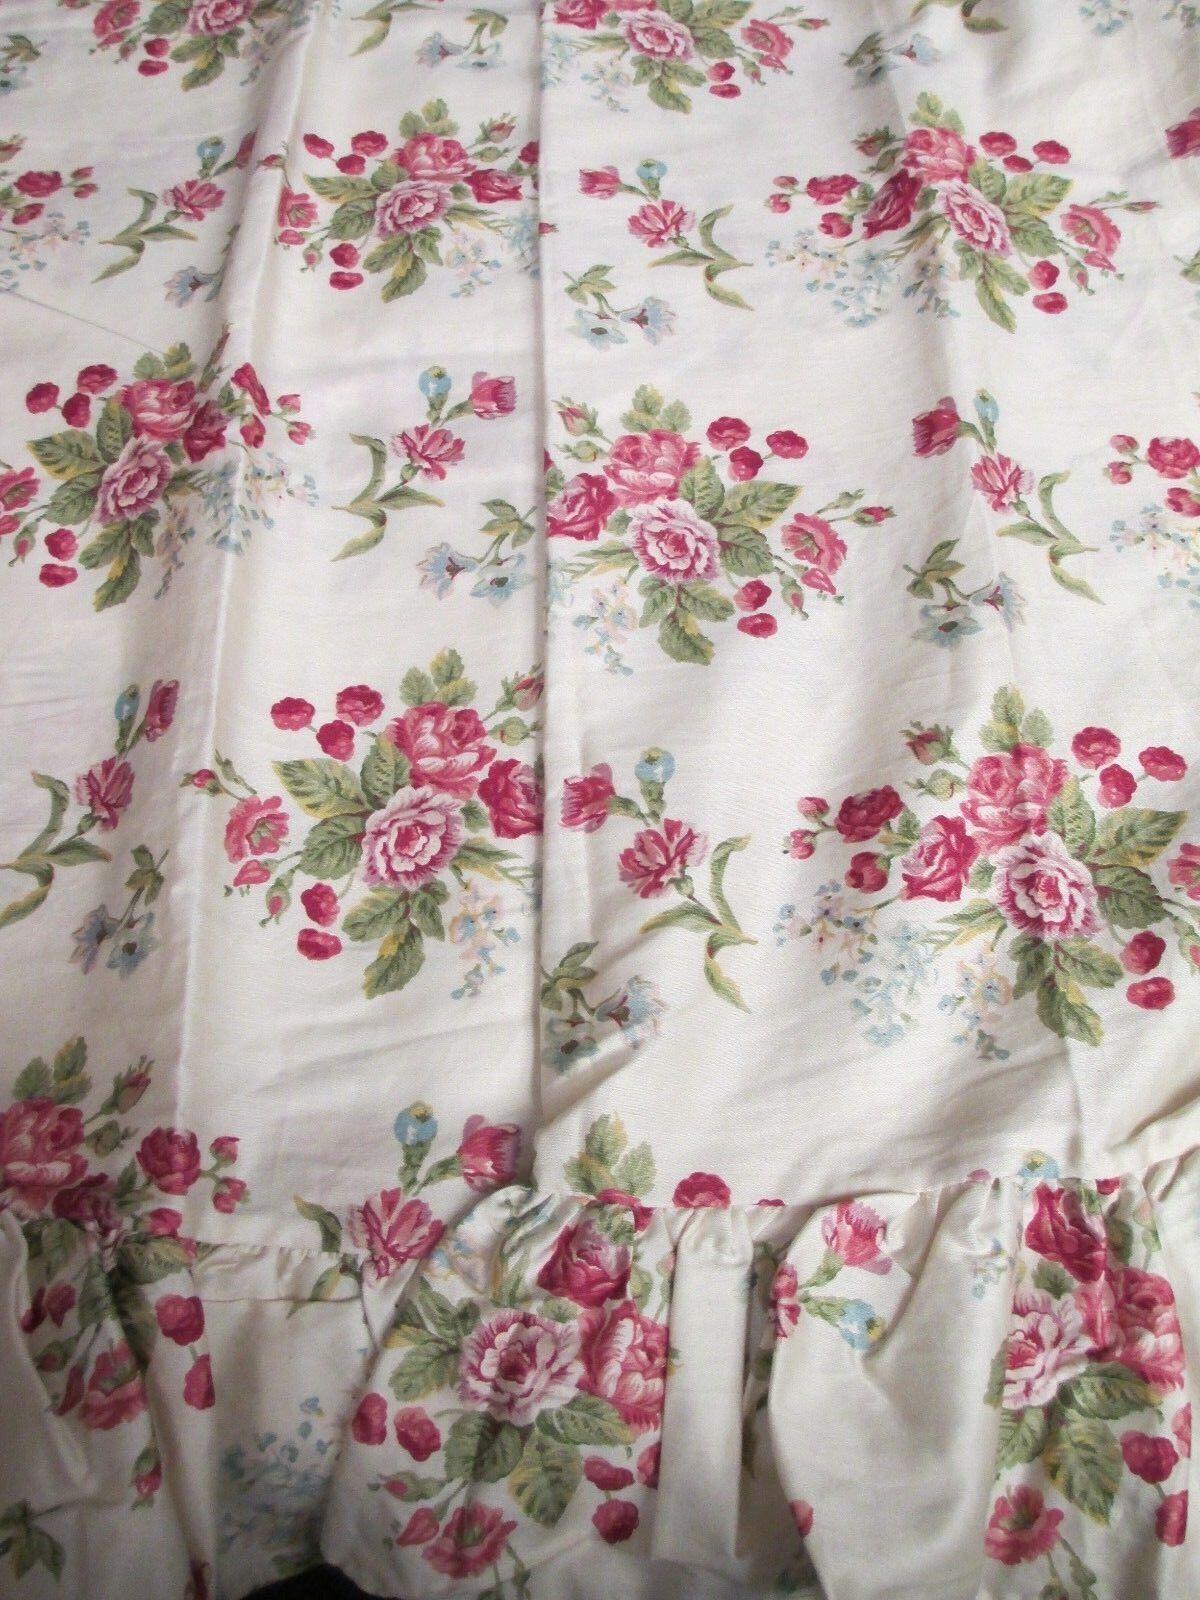 New RALPH LAUREN Emily Anne EmilyAnne 2 Floral Ruffled Standard Pillowcases